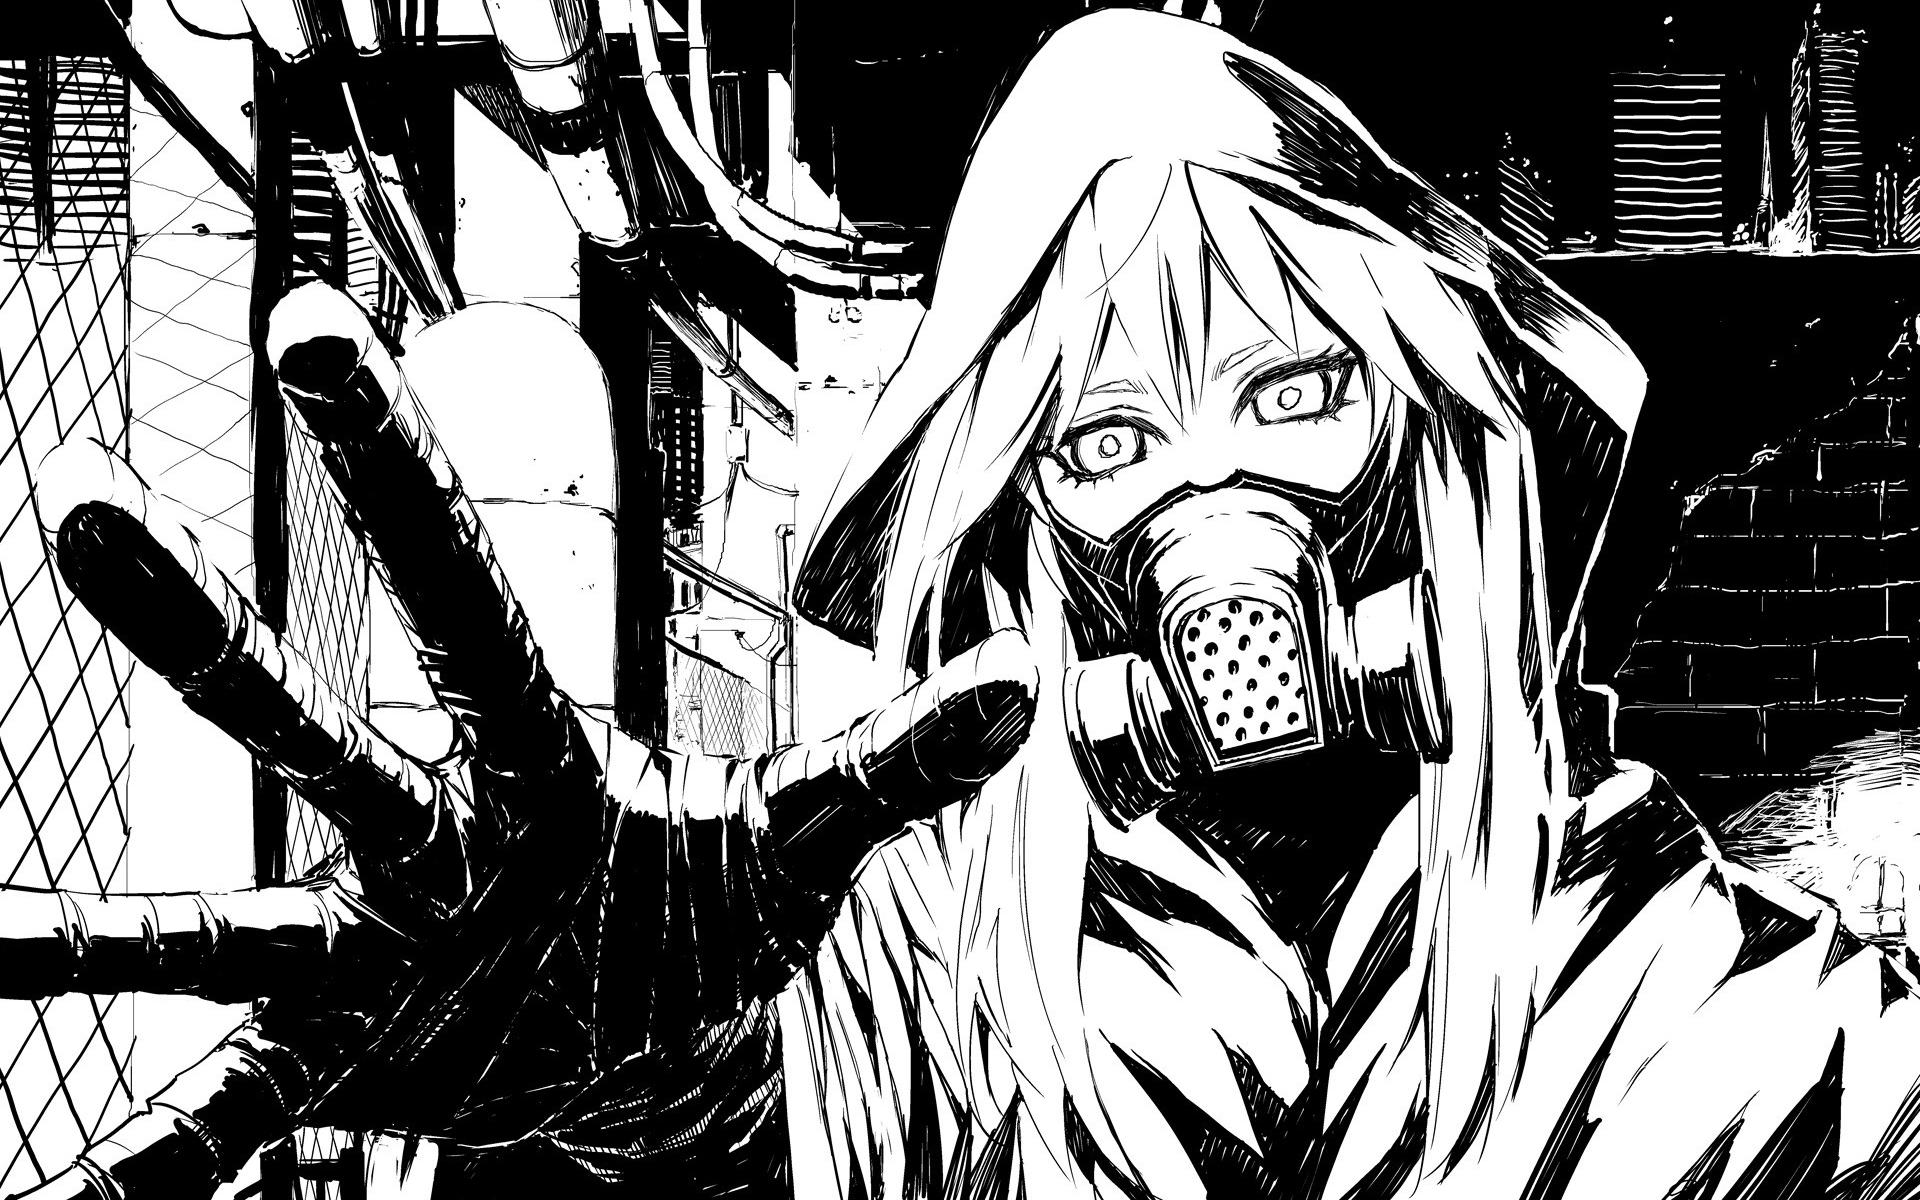 Scared masked girl black white